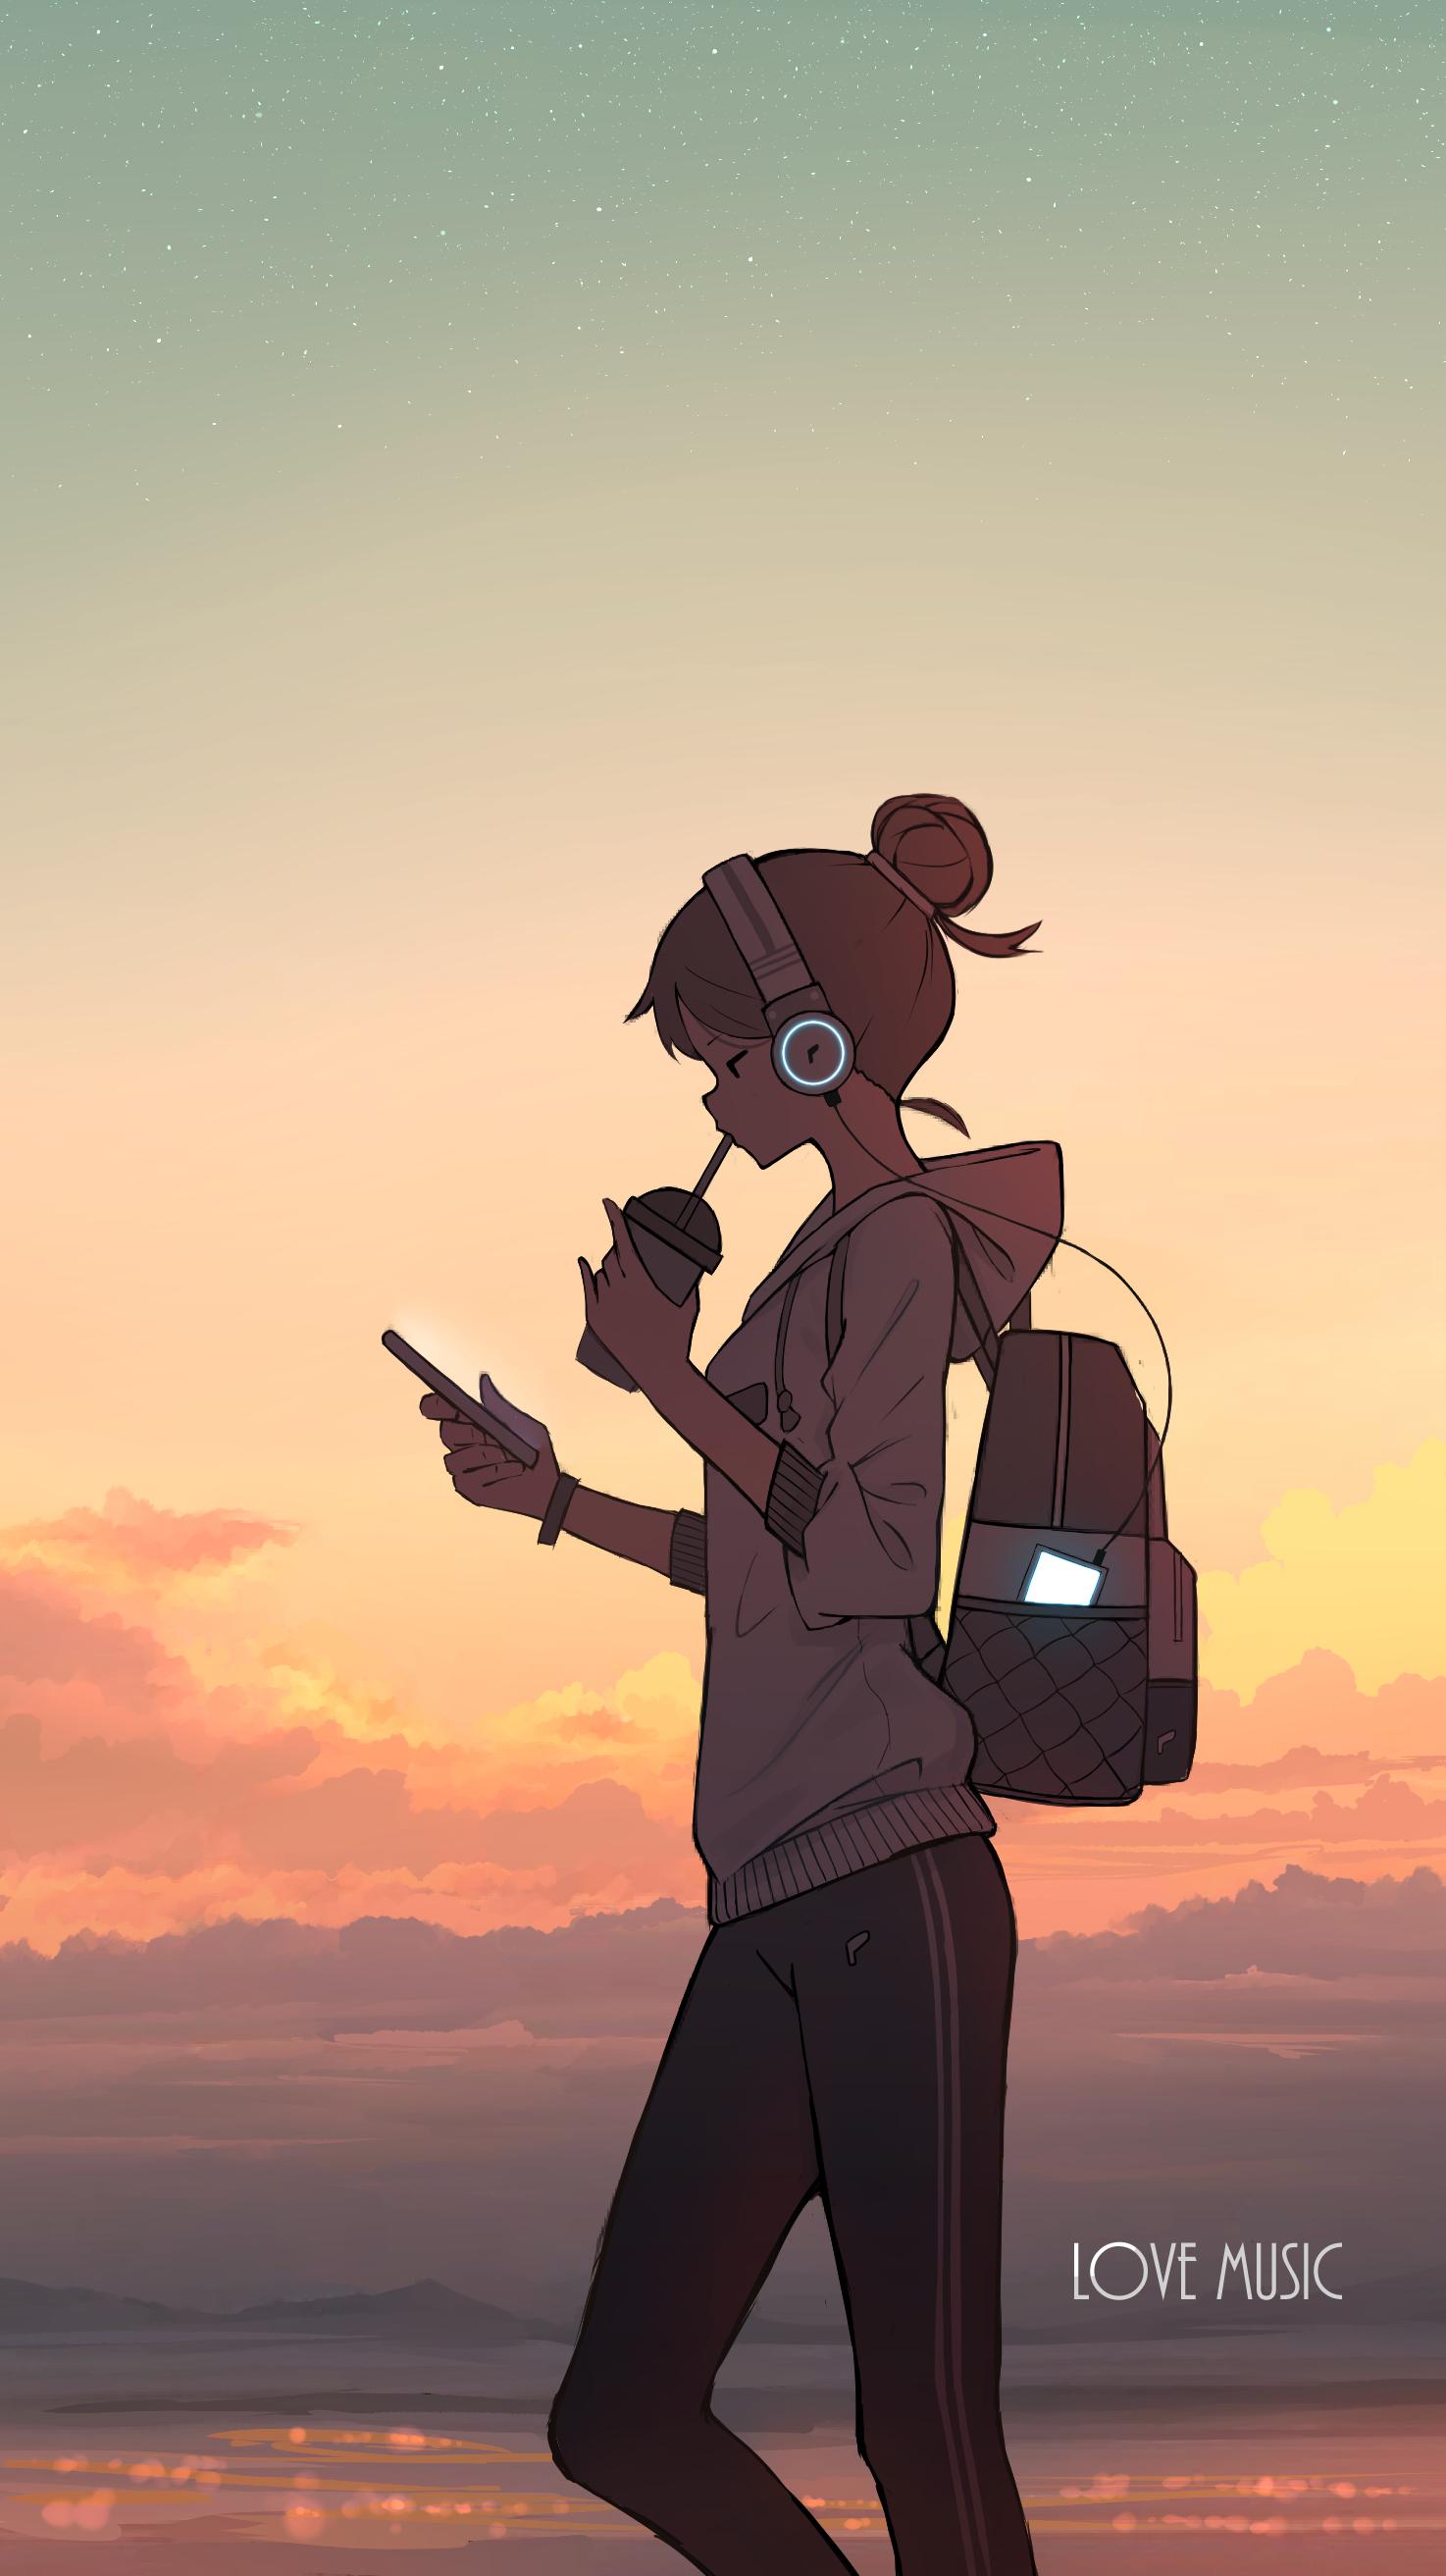 Anime Anime Girls Headphones Sunset 1474x2625